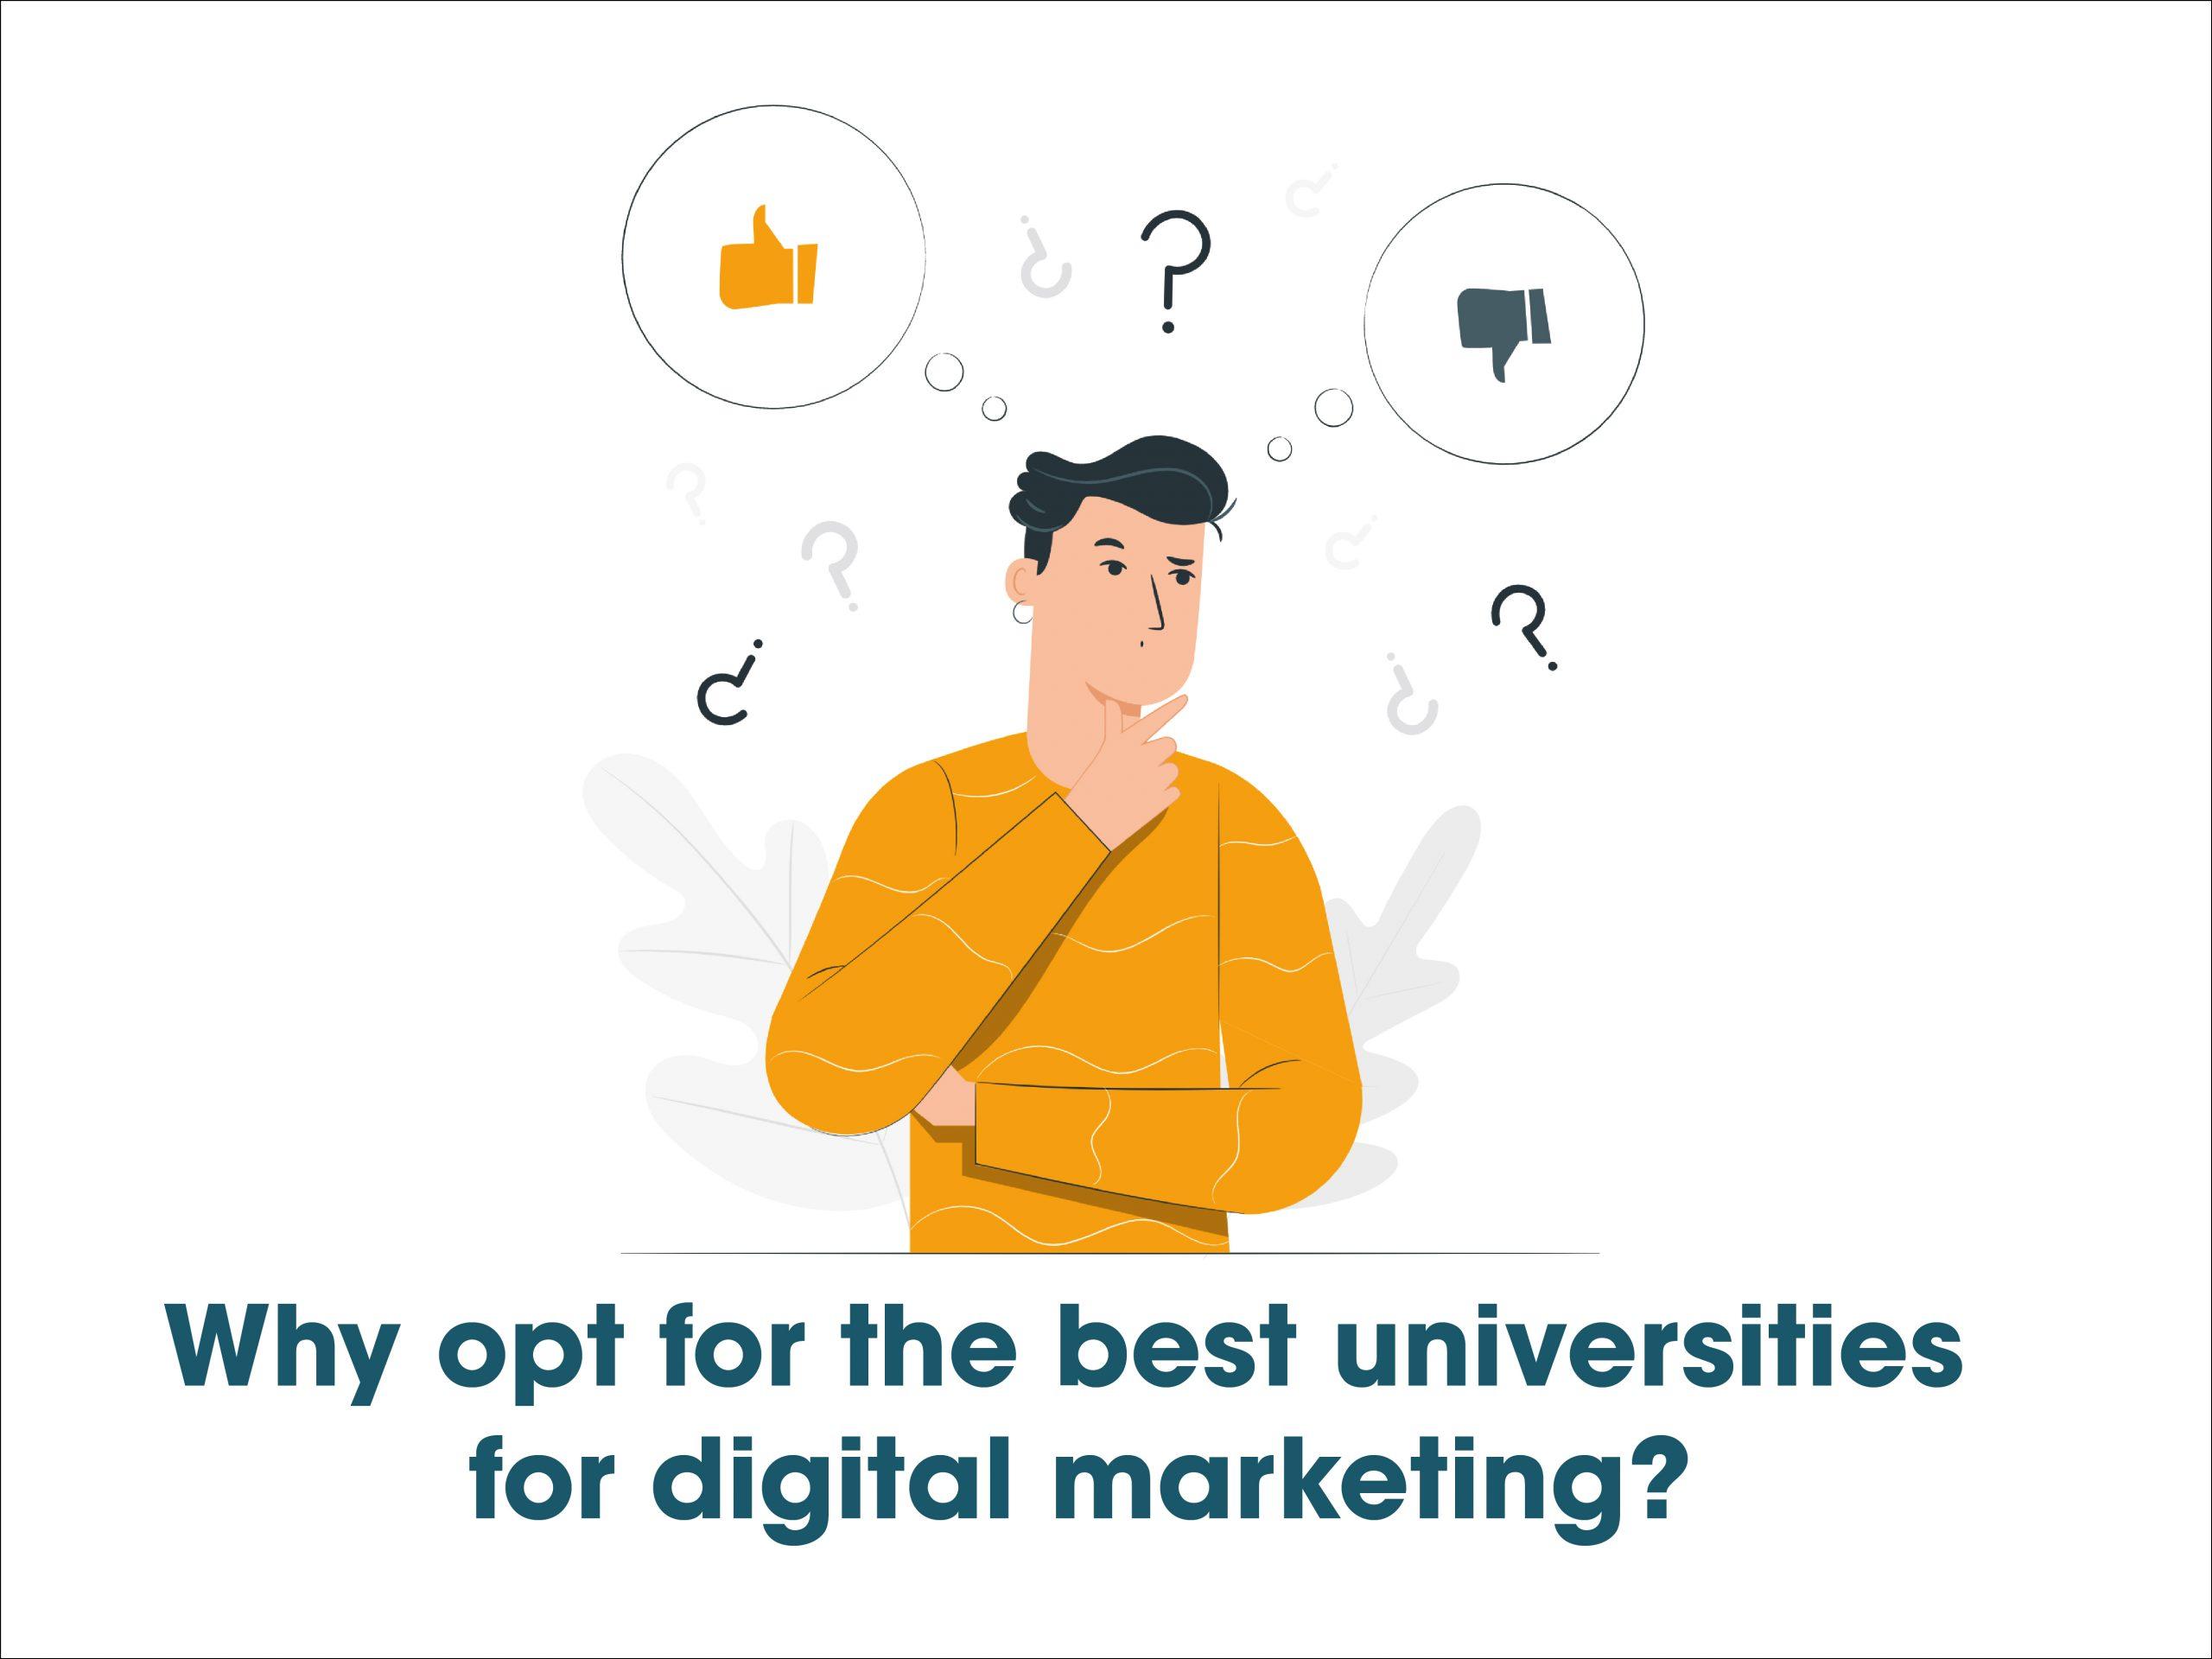 best universities for digital marketing